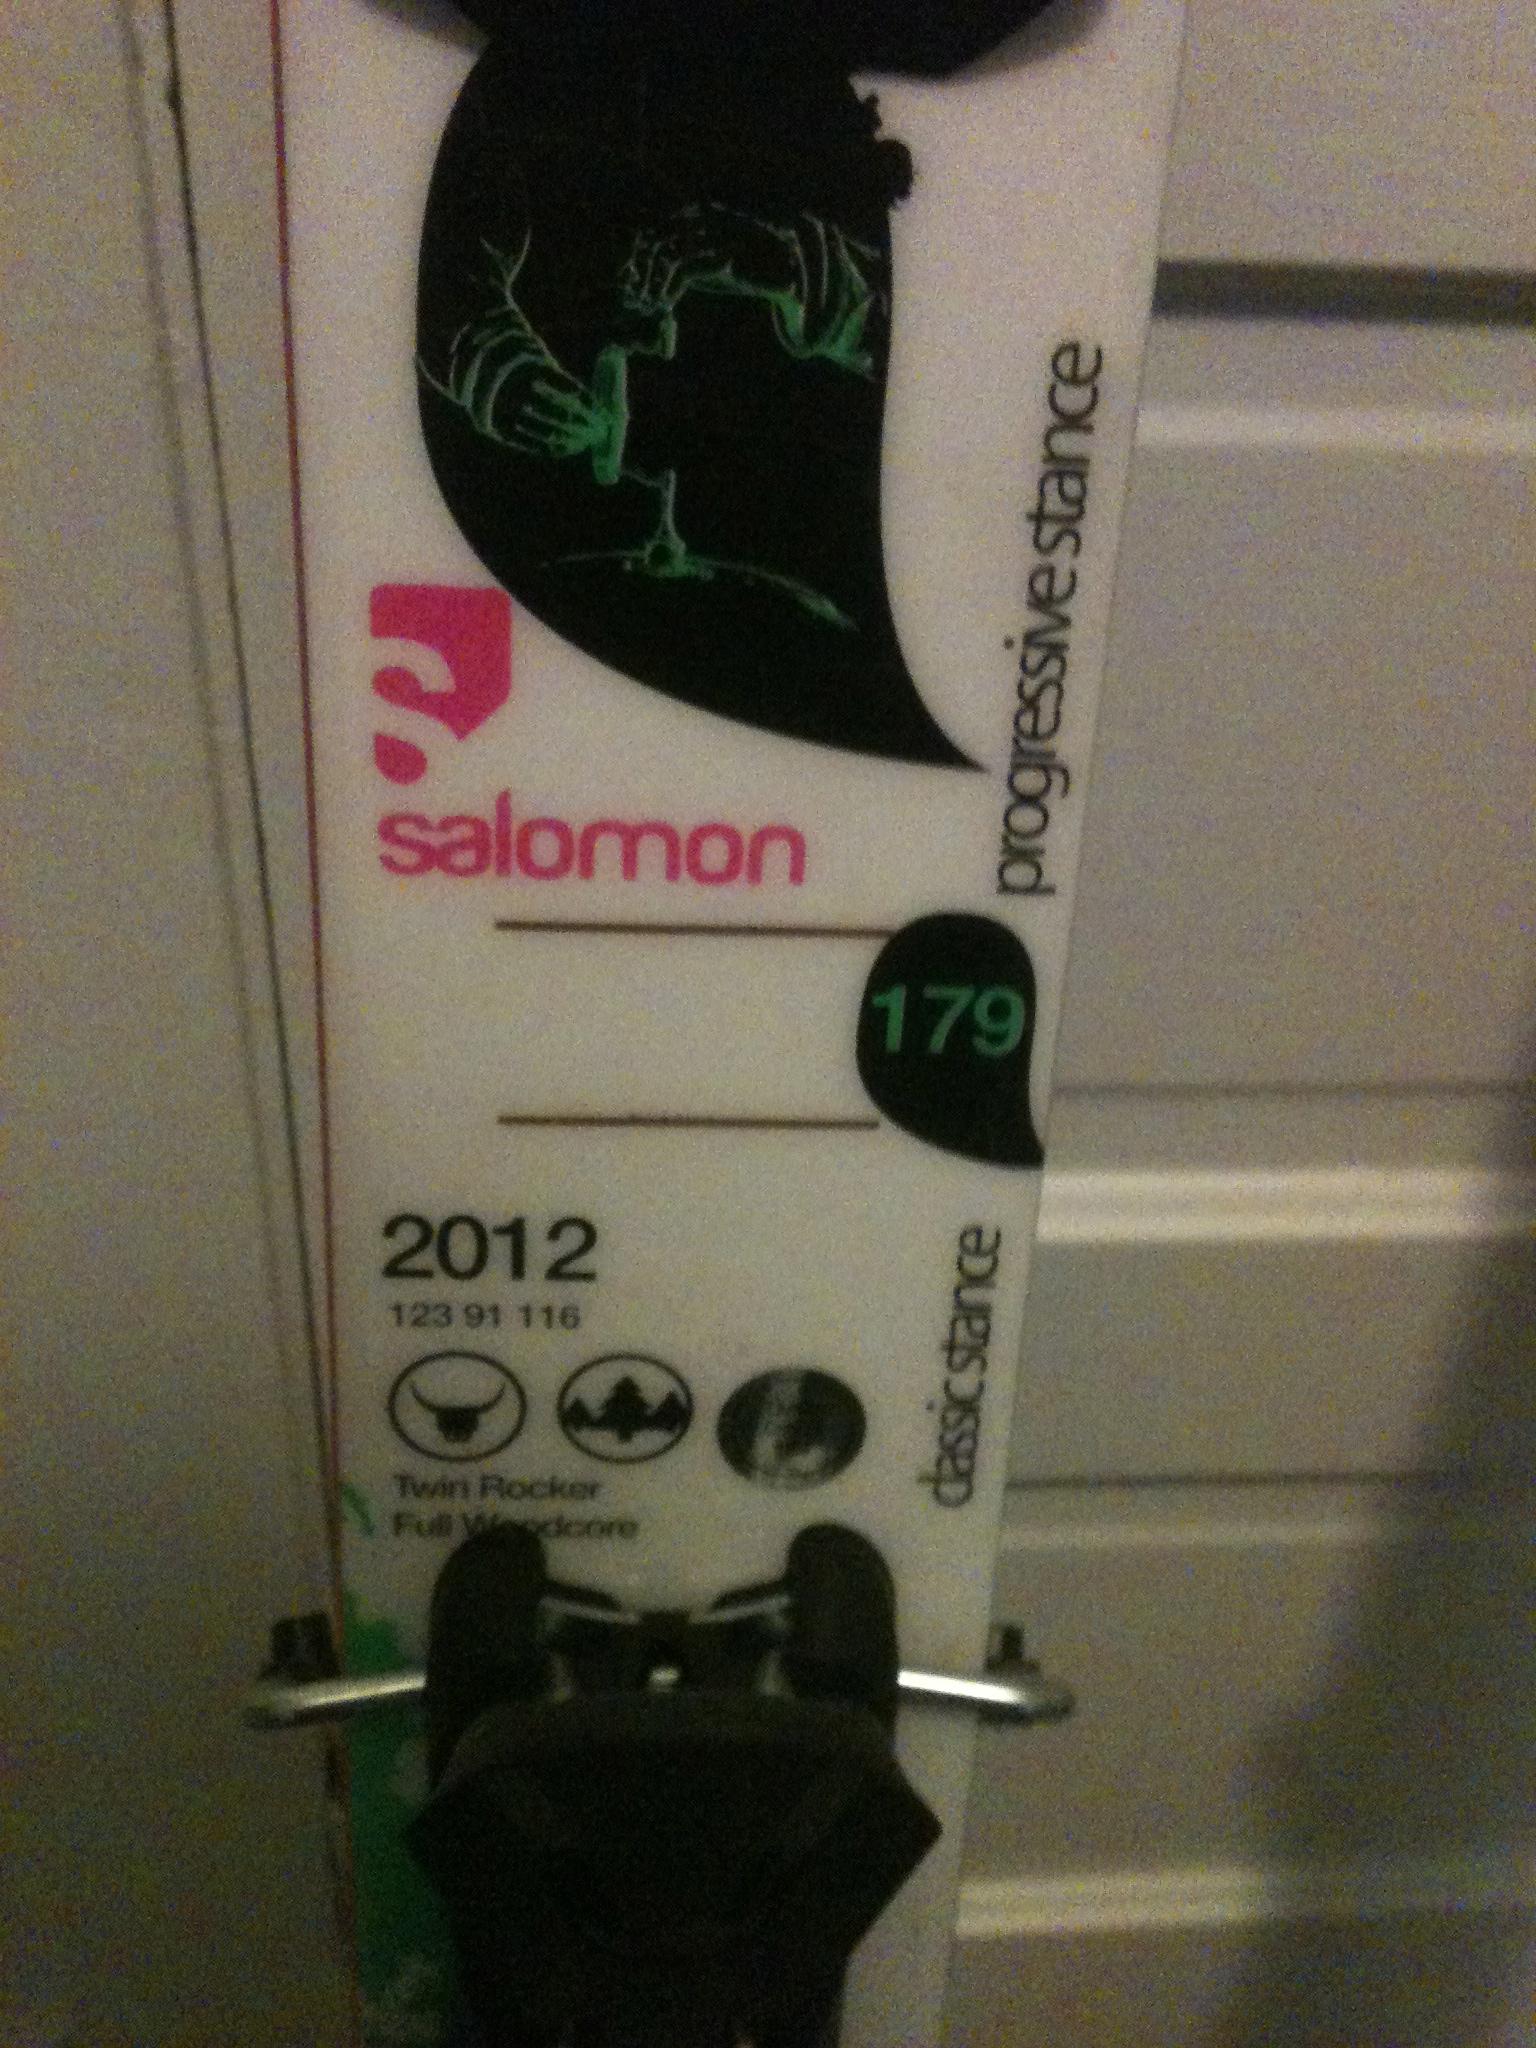 Salomon 2012